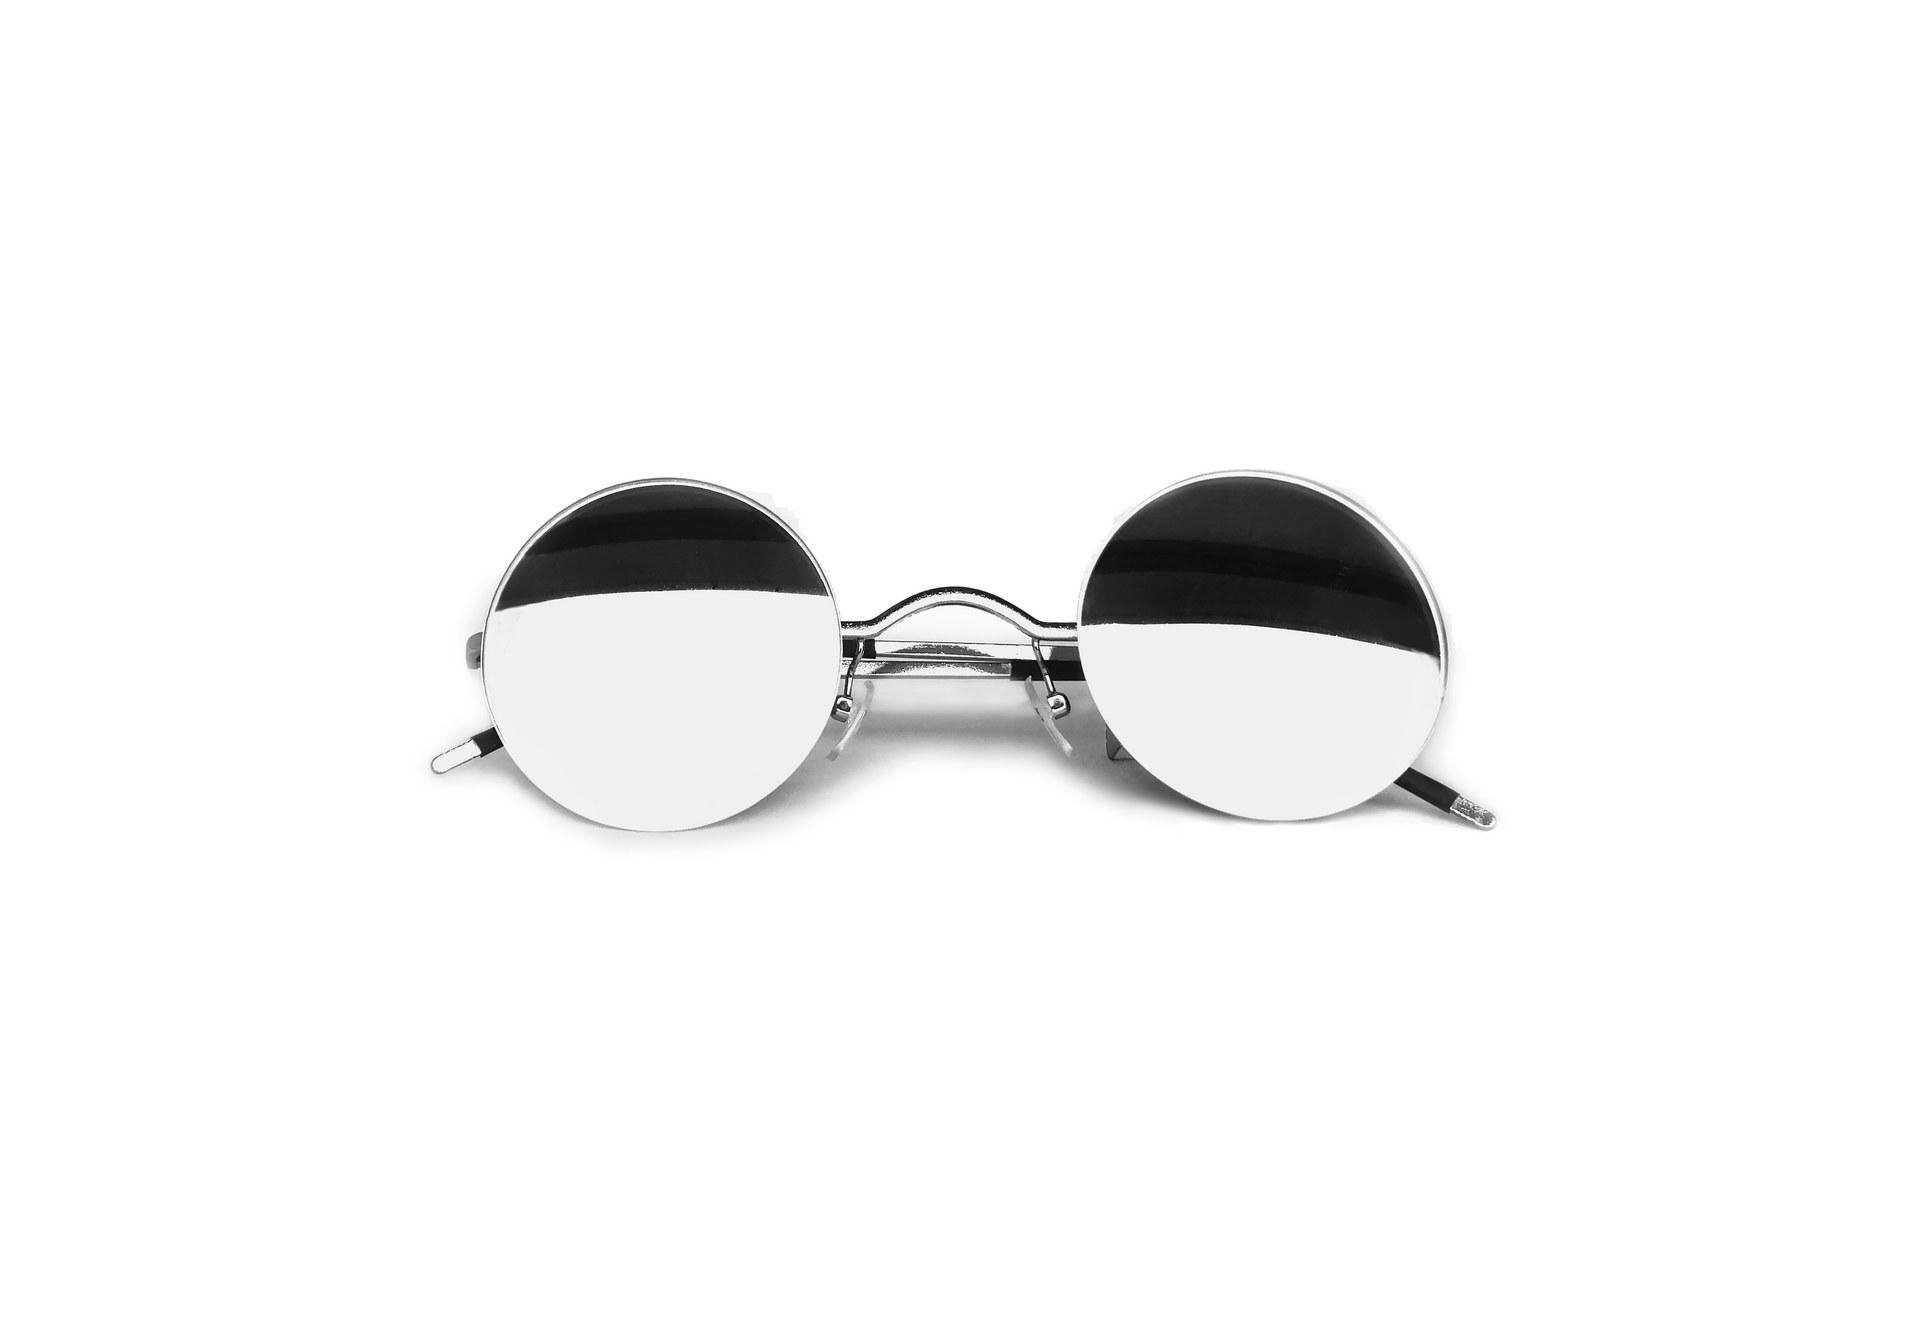 Gaze at the gazer-Glasses